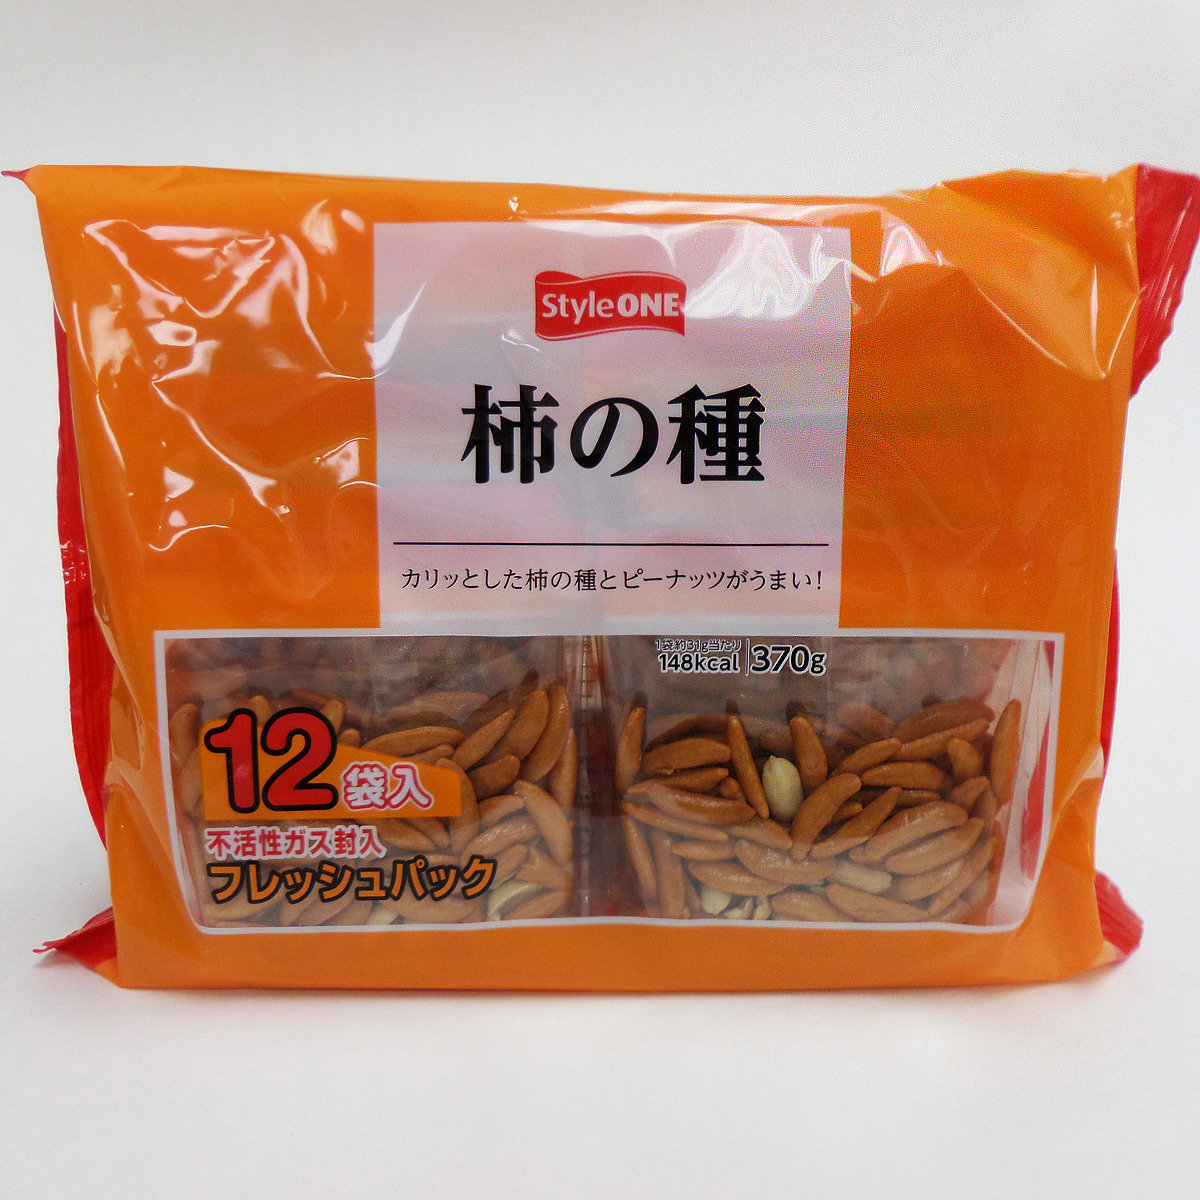 Style One 柿之種米菓